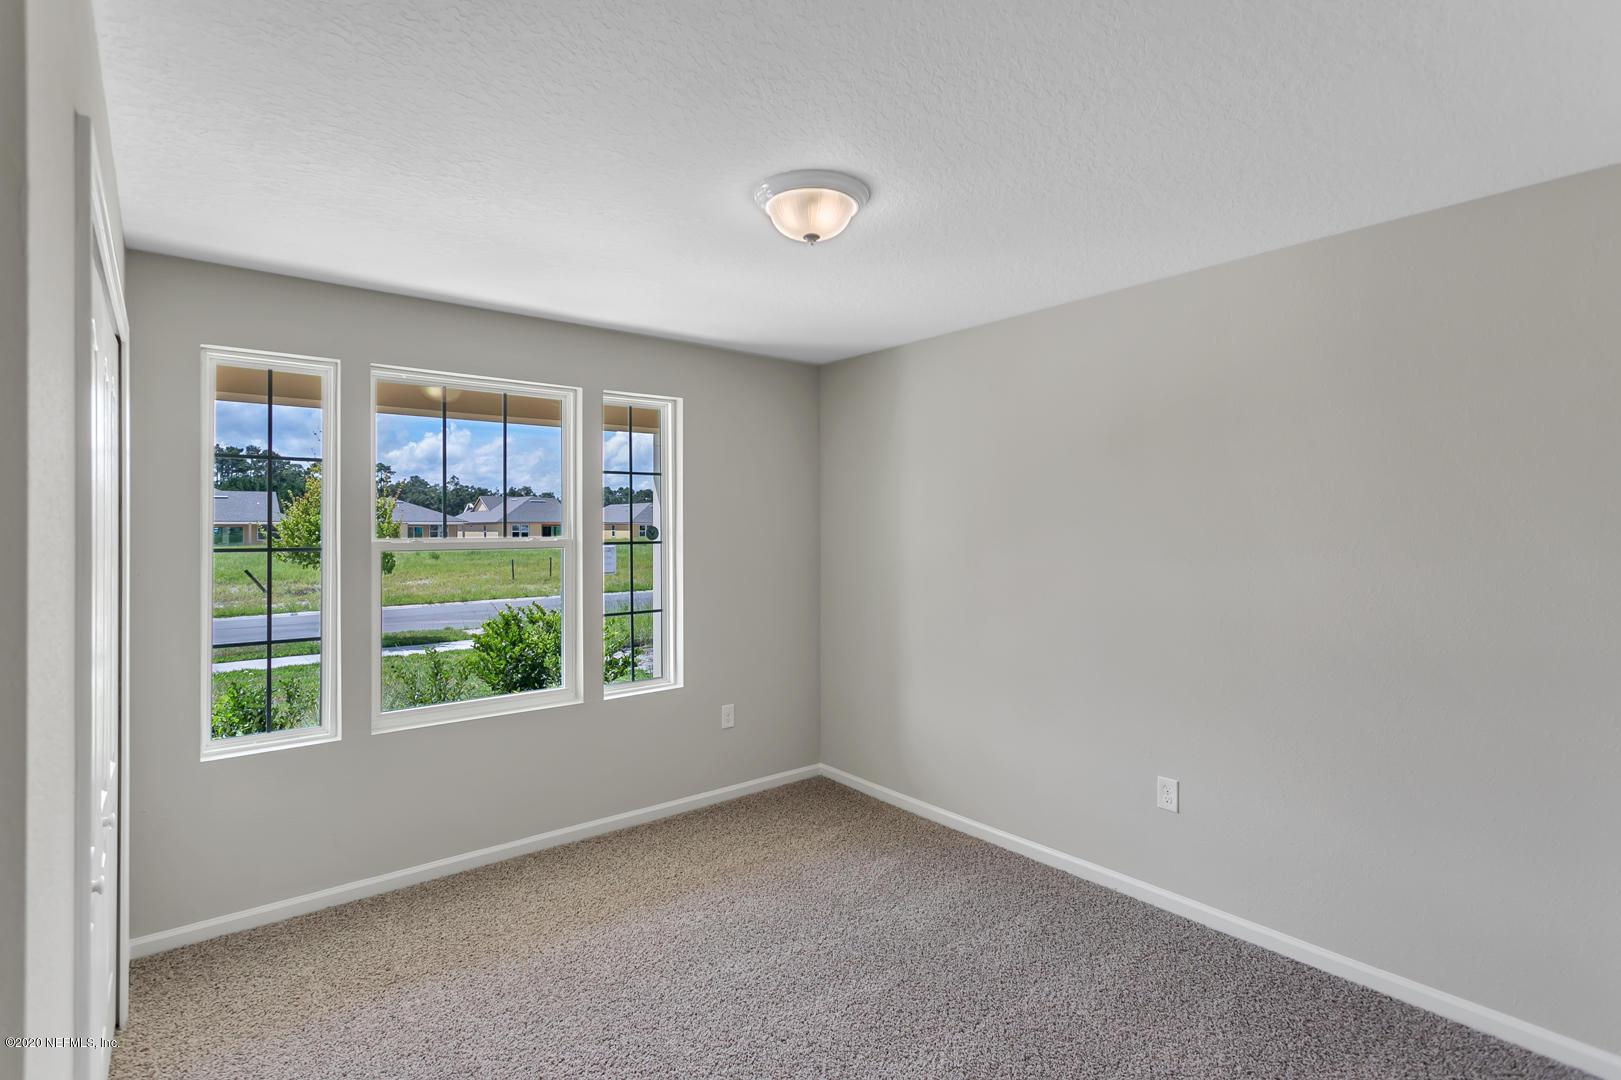 4297 GREEN RIVER, MIDDLEBURG, FLORIDA 32068, 3 Bedrooms Bedrooms, ,2 BathroomsBathrooms,Residential,For sale,GREEN RIVER,1046305